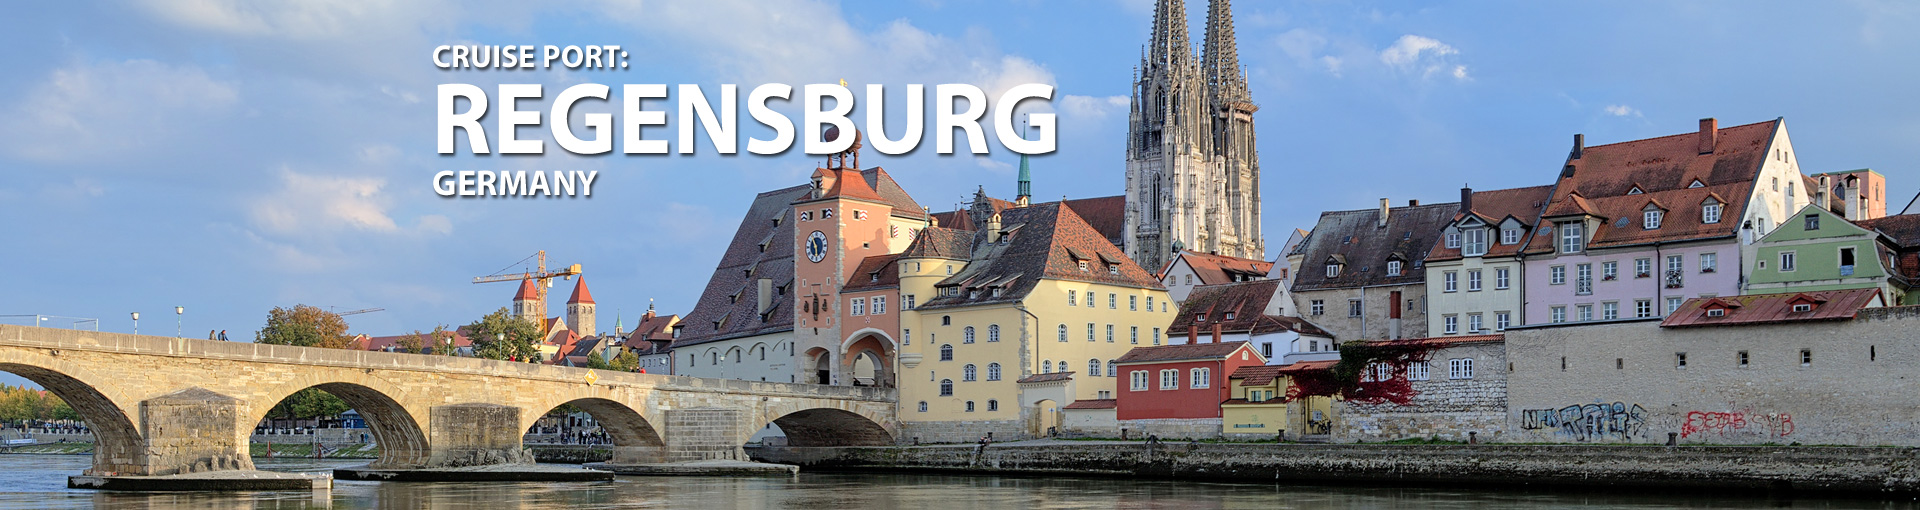 Cruises to Regensburg, Germany